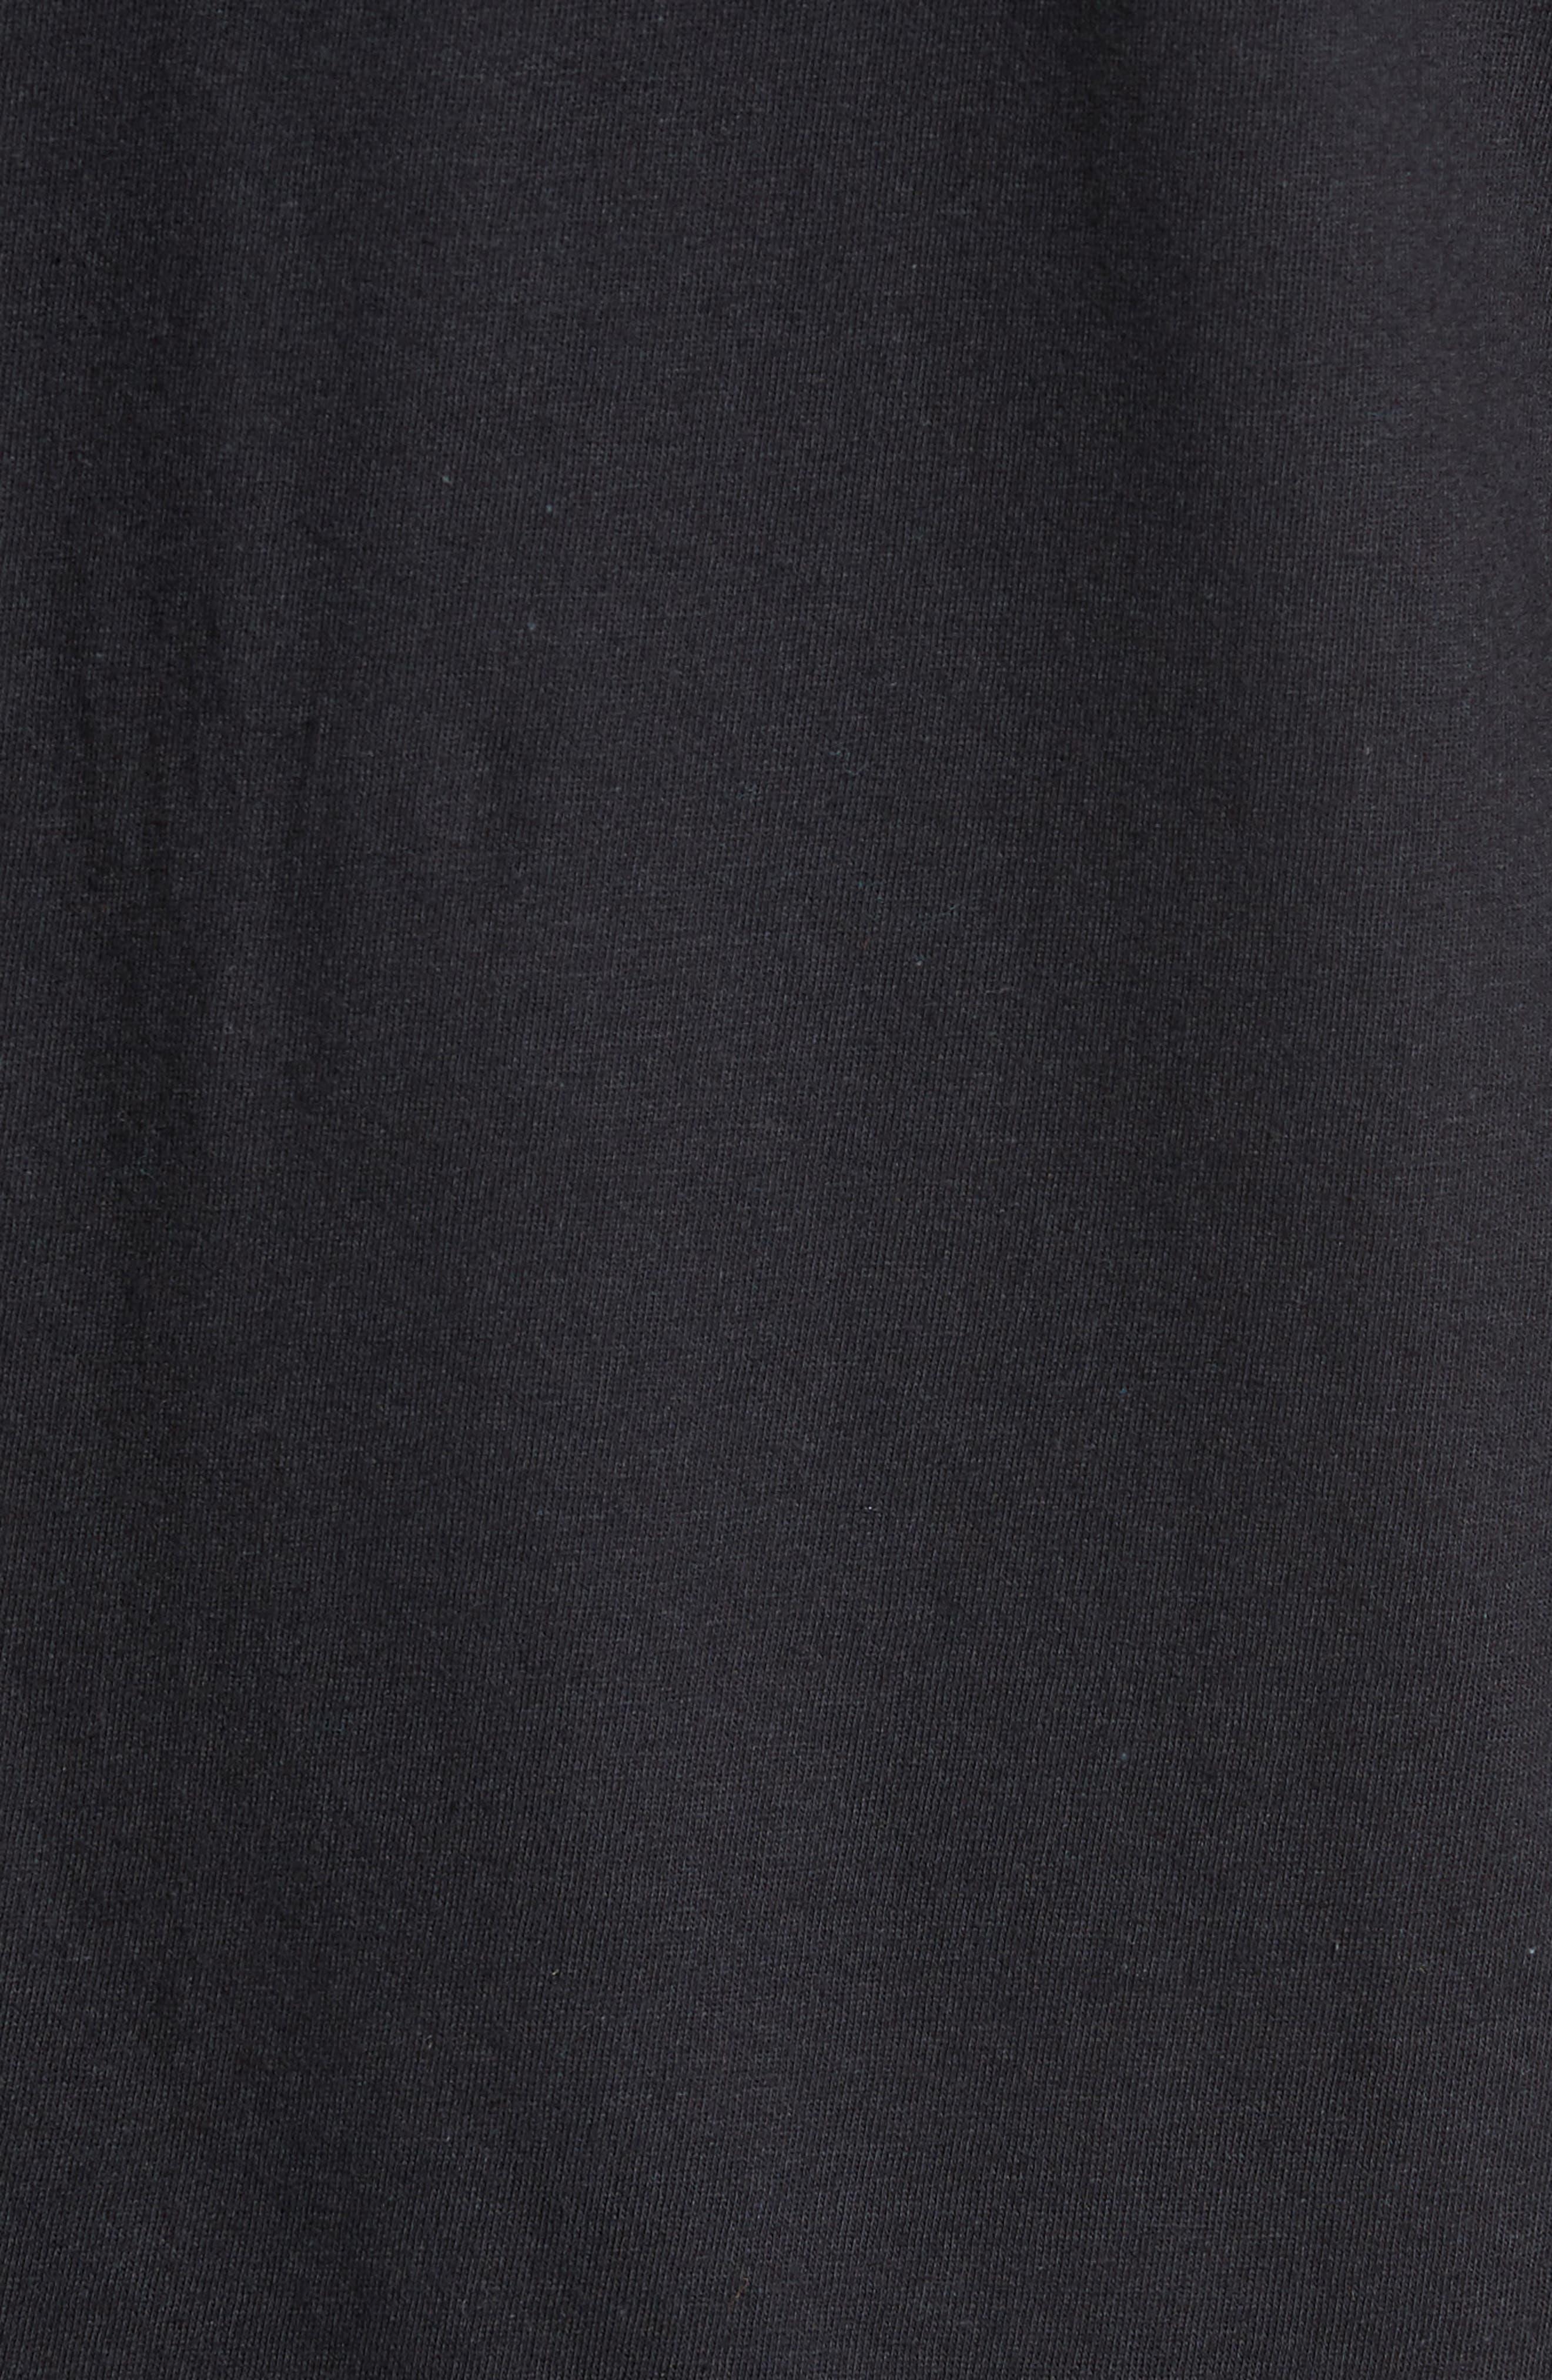 Bone Thugs-n-Harmony T-Shirt,                             Alternate thumbnail 5, color,                             Black Tee Bone Thugs